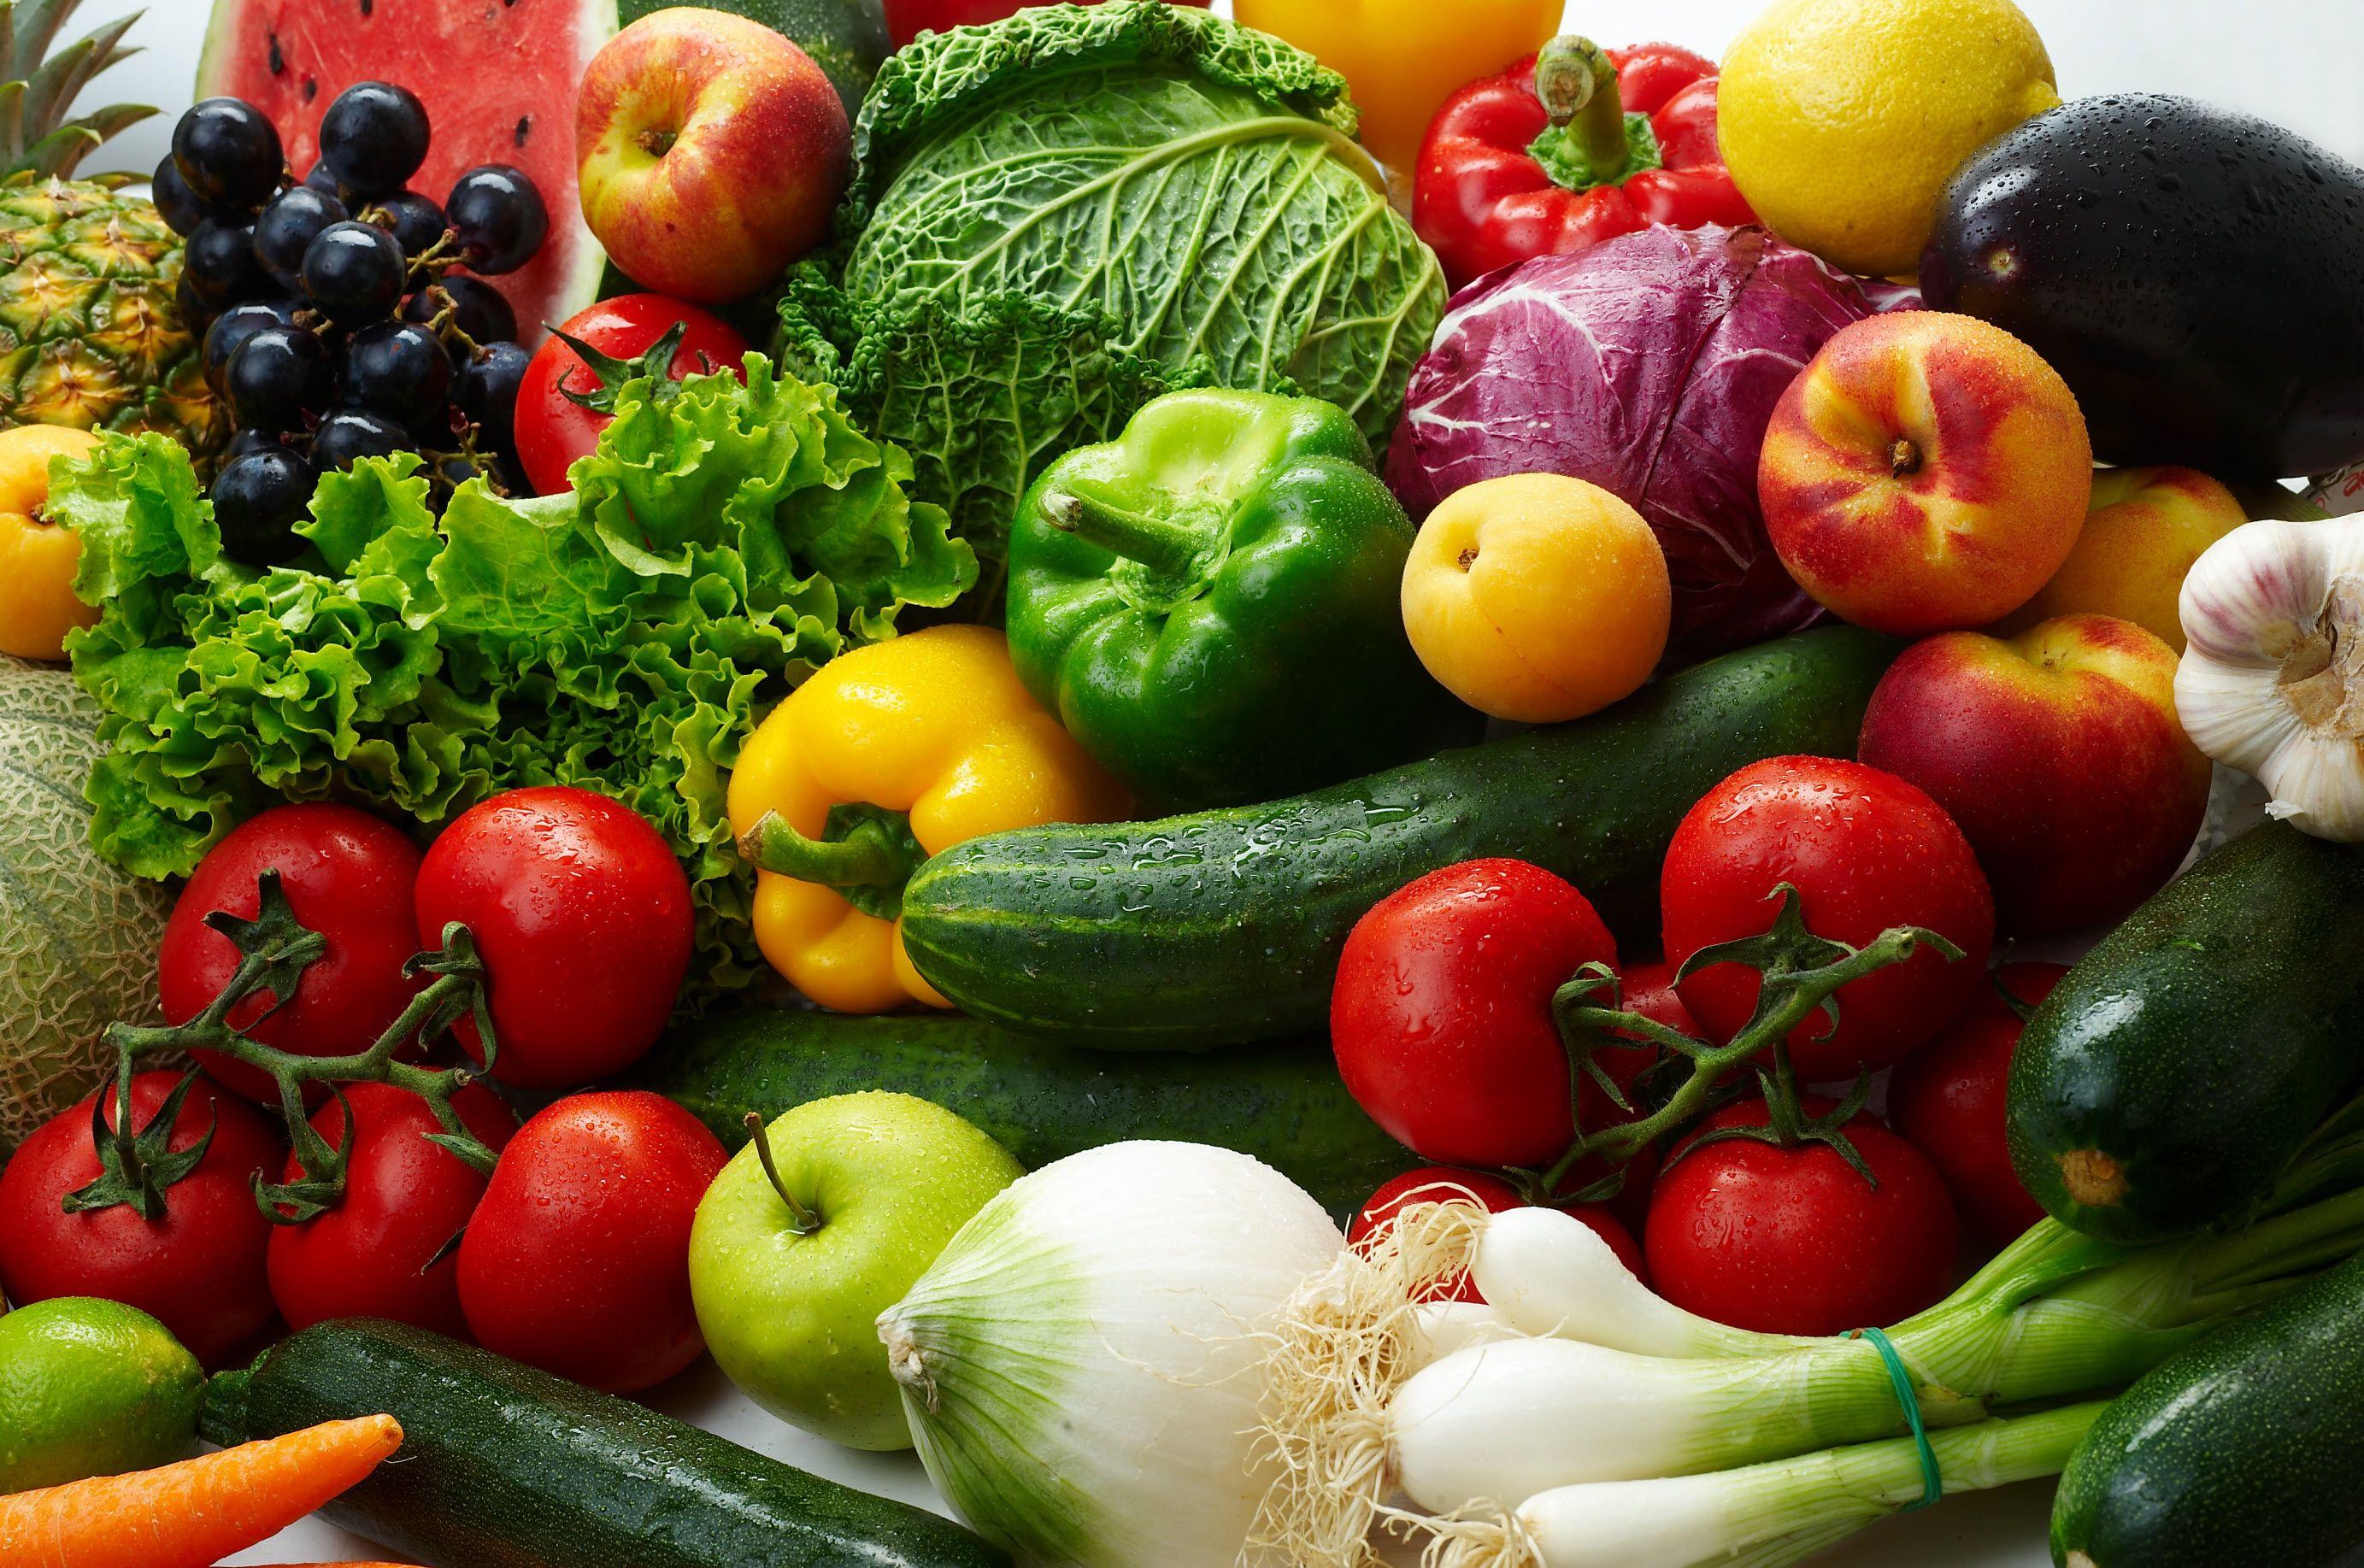 Fresh Organic Fruits And Veggies Growing Plants Indoors 400 x 300